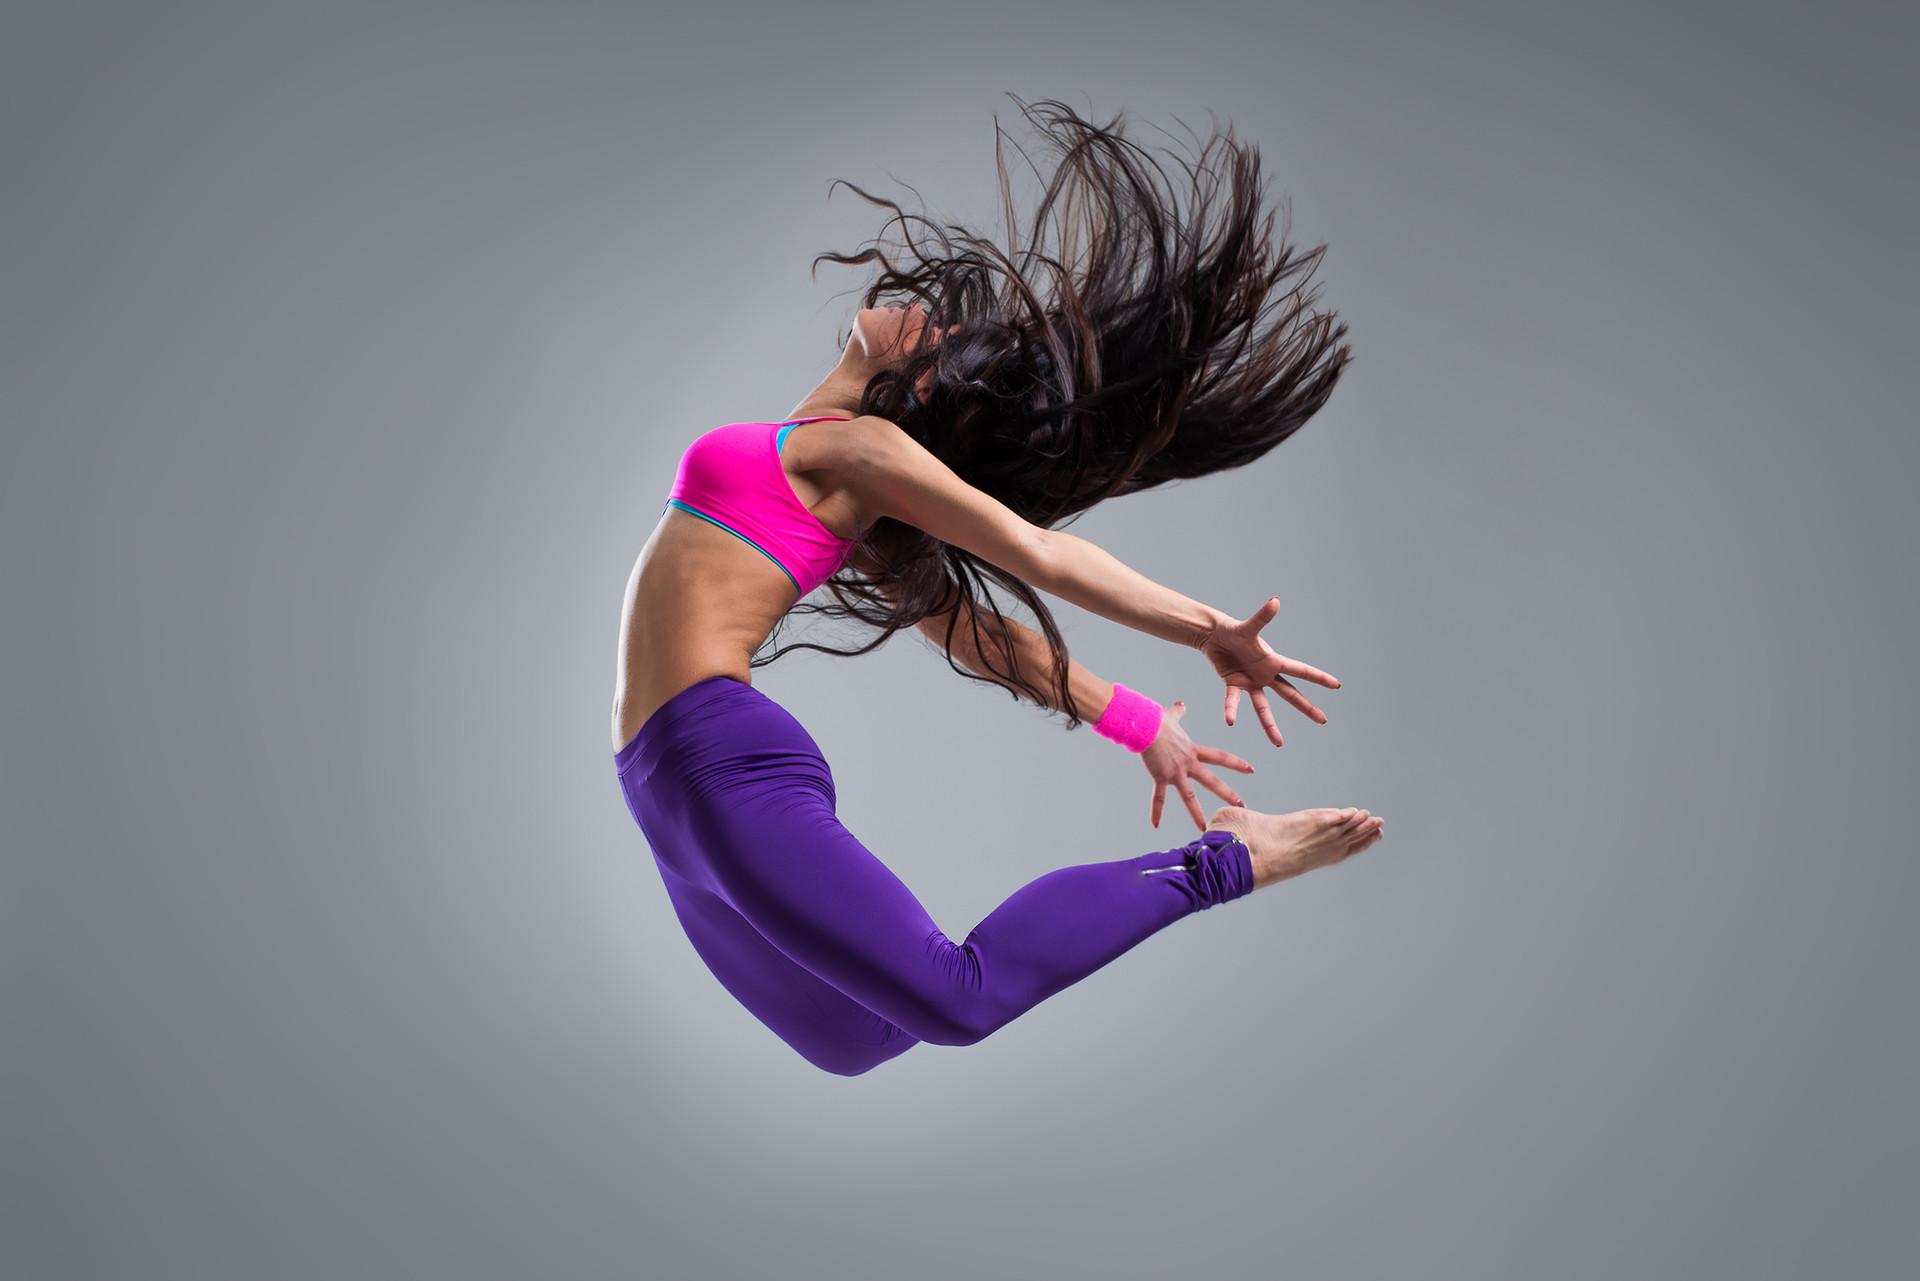 Dancer jump.jpg